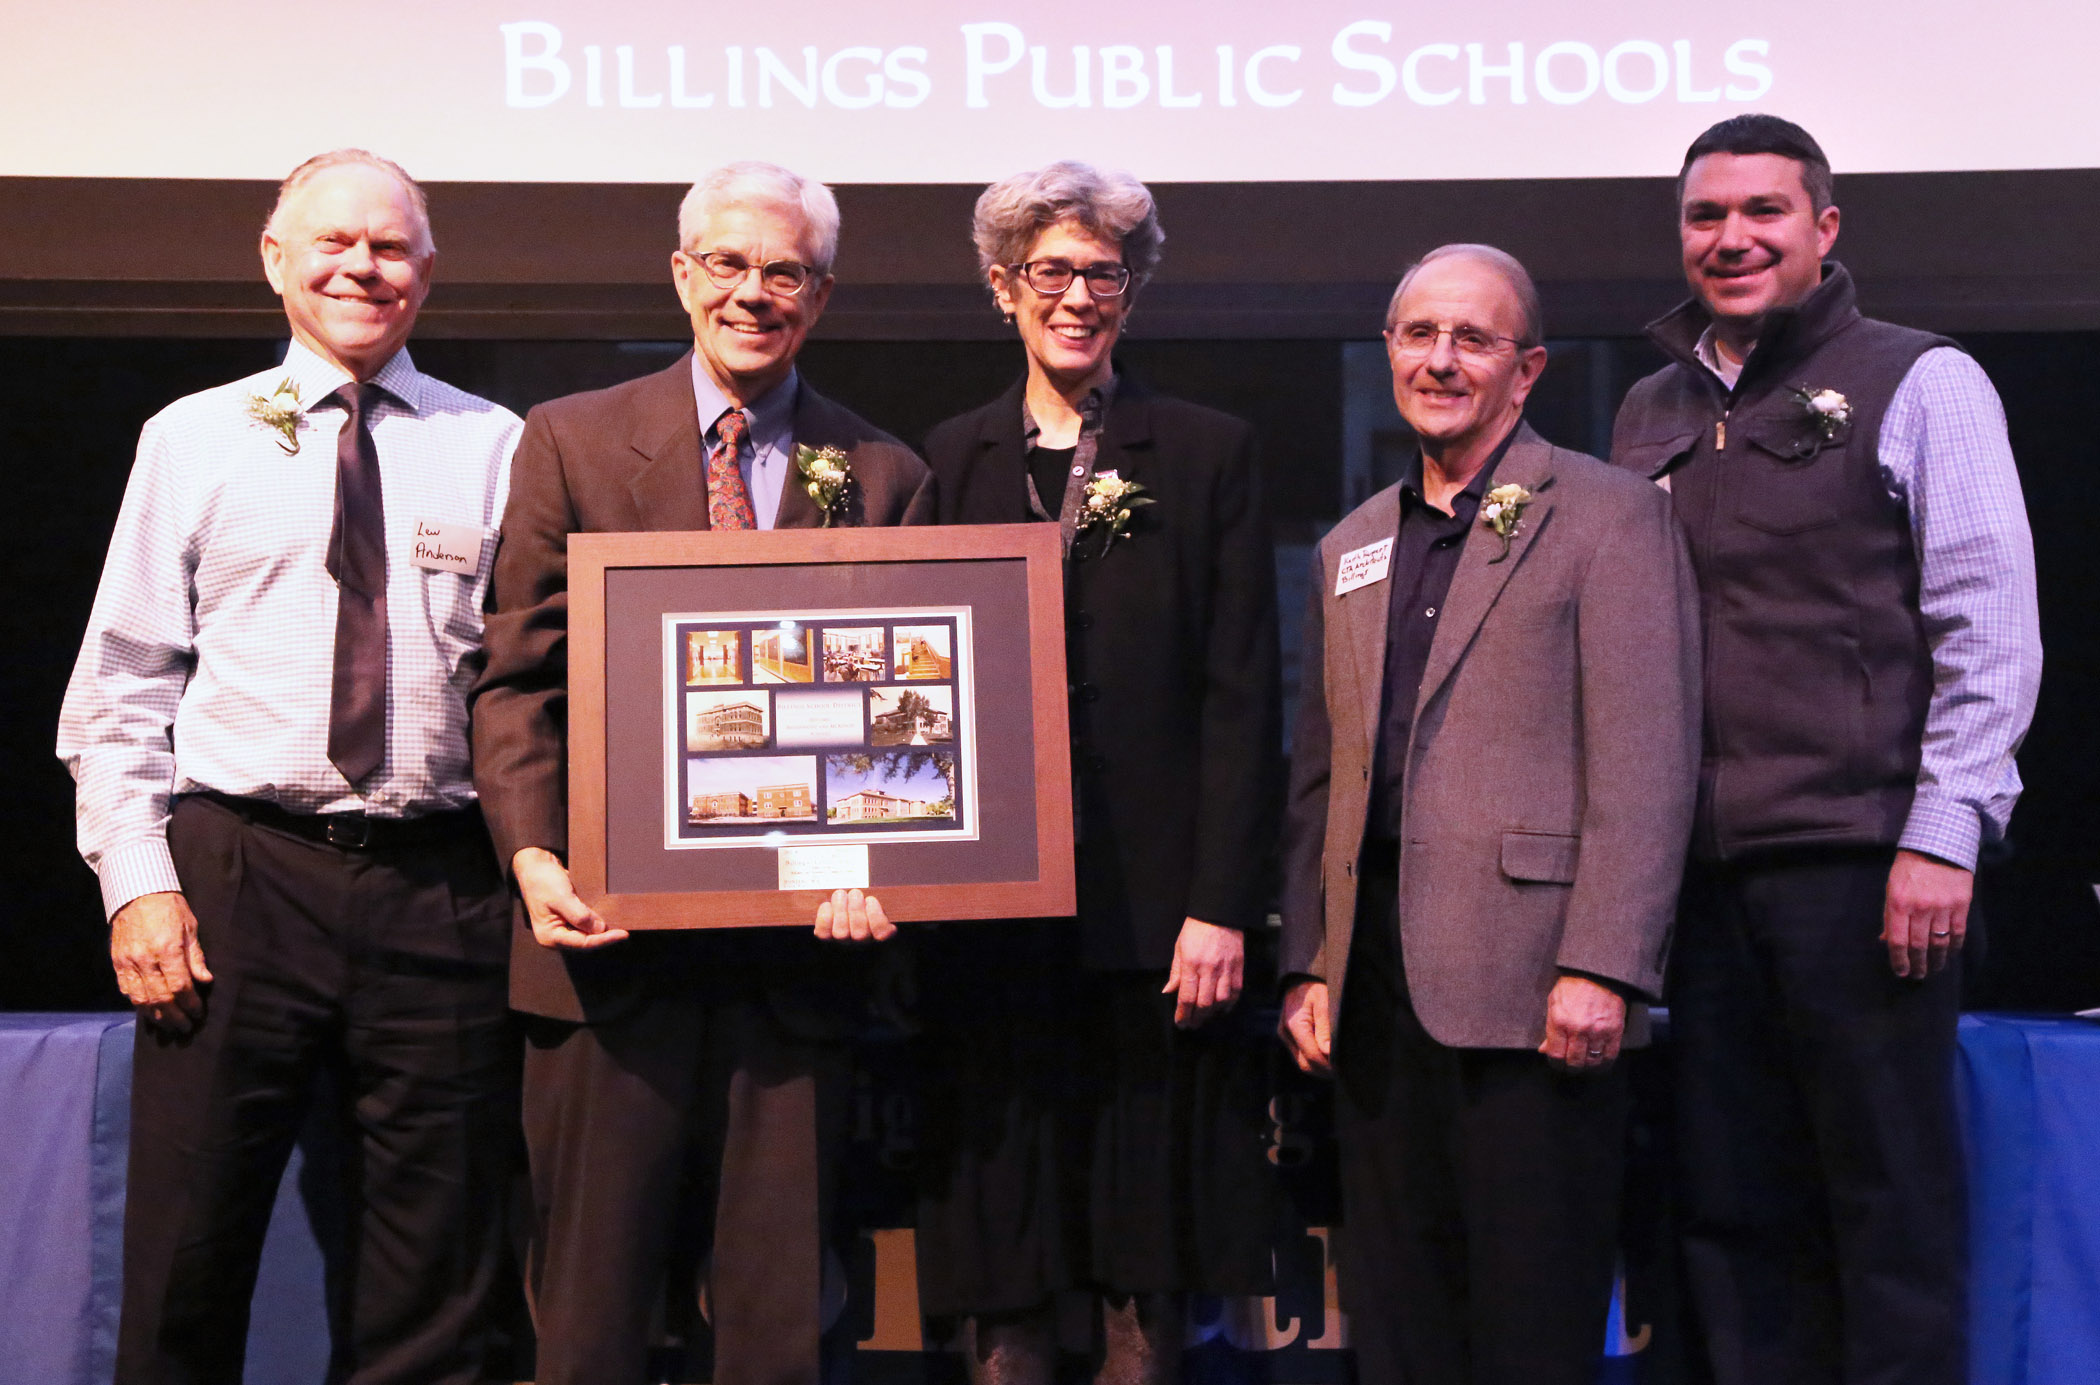 Billings Public Schools